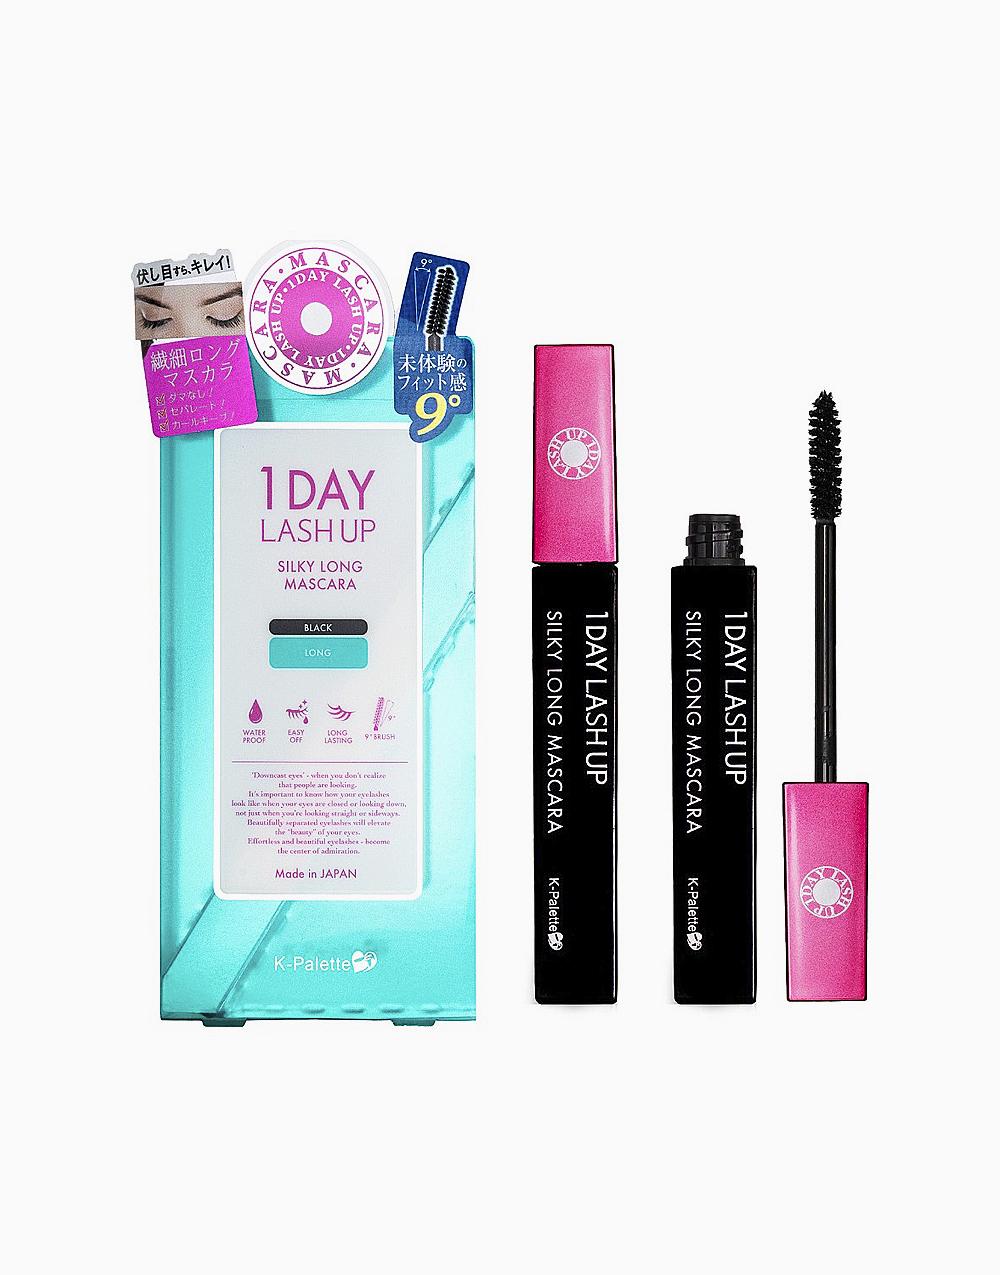 1Day Lash Up Mascara by K-Palette | Silky Long